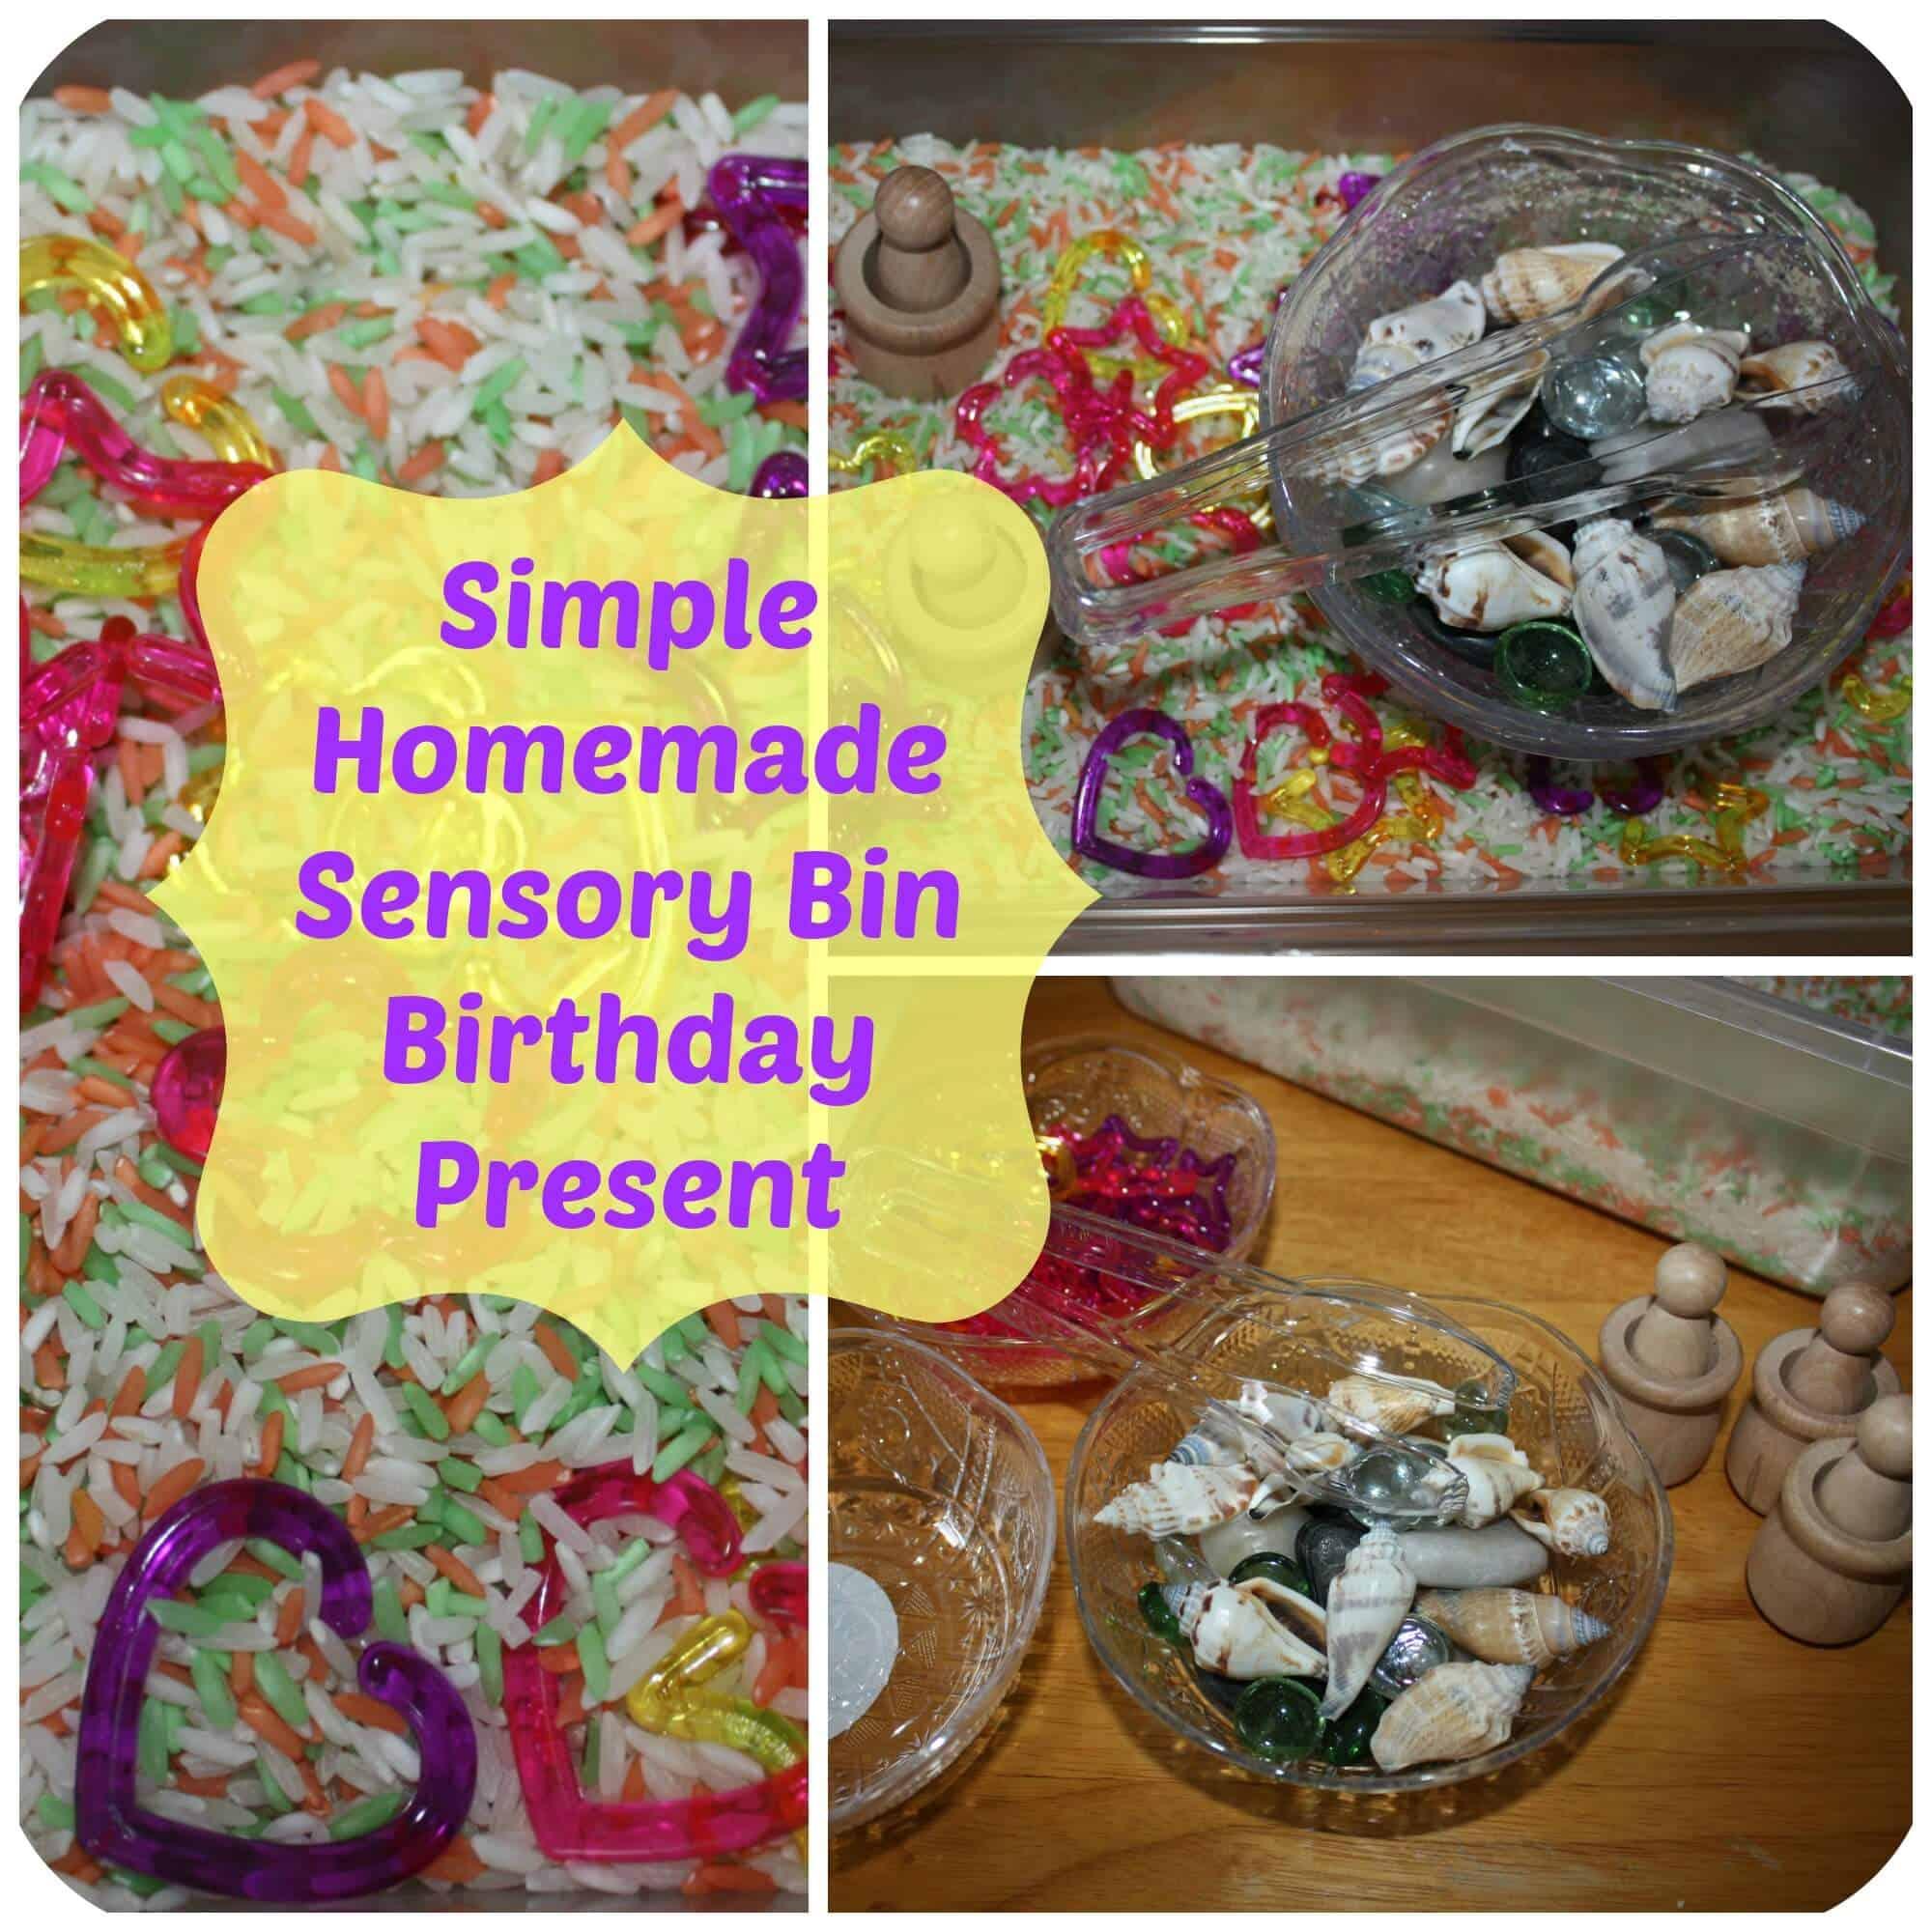 Homemade Present Sensory Bin: A Gift of Exploration